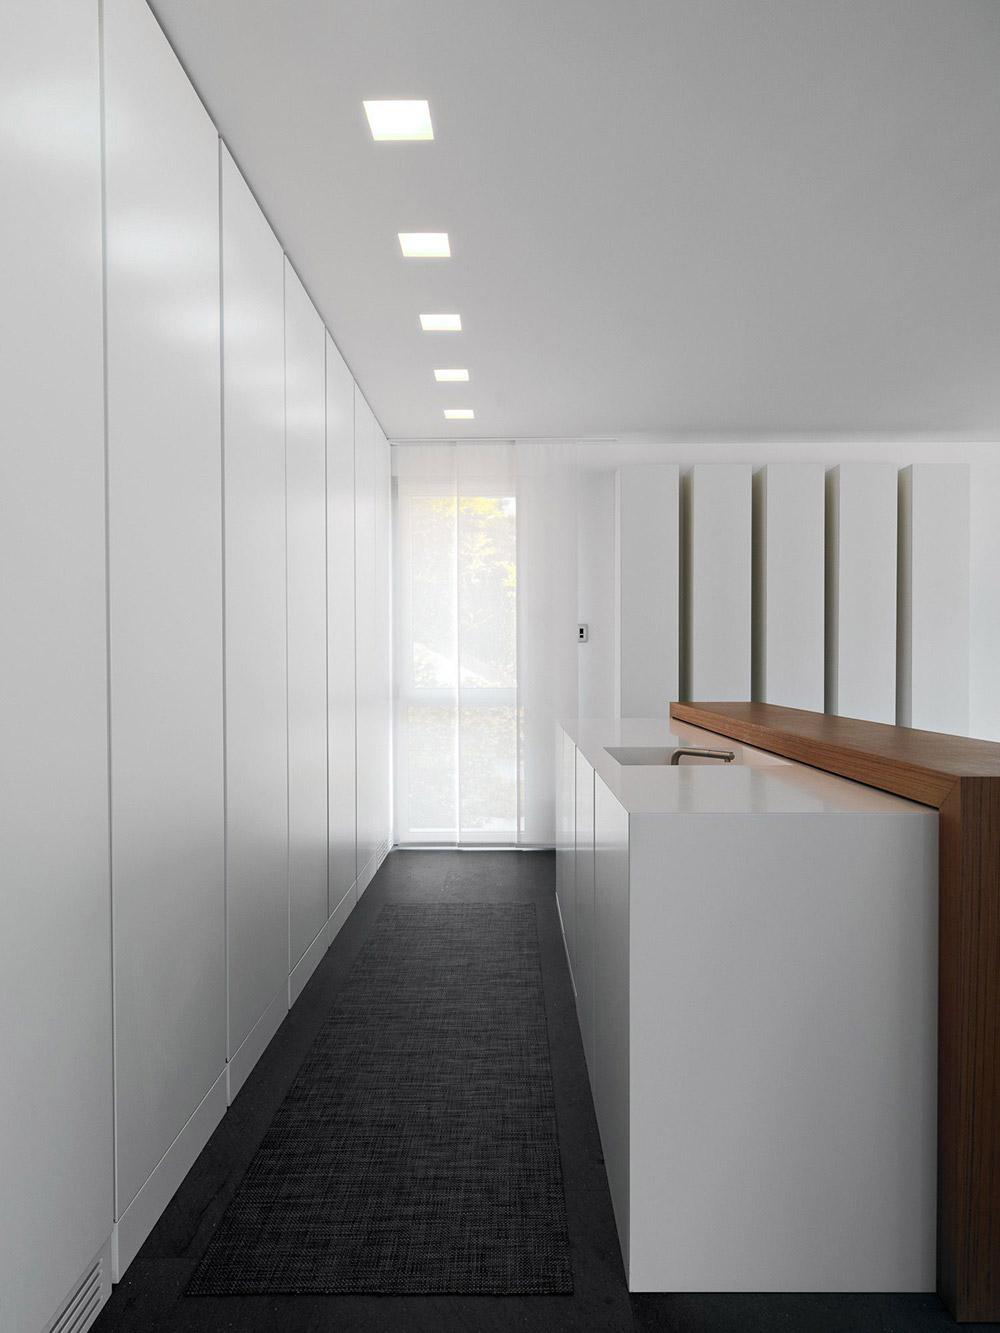 Compact Kitchen, Minimalist Home in Lugano, Switzerland by Victor Vasilev